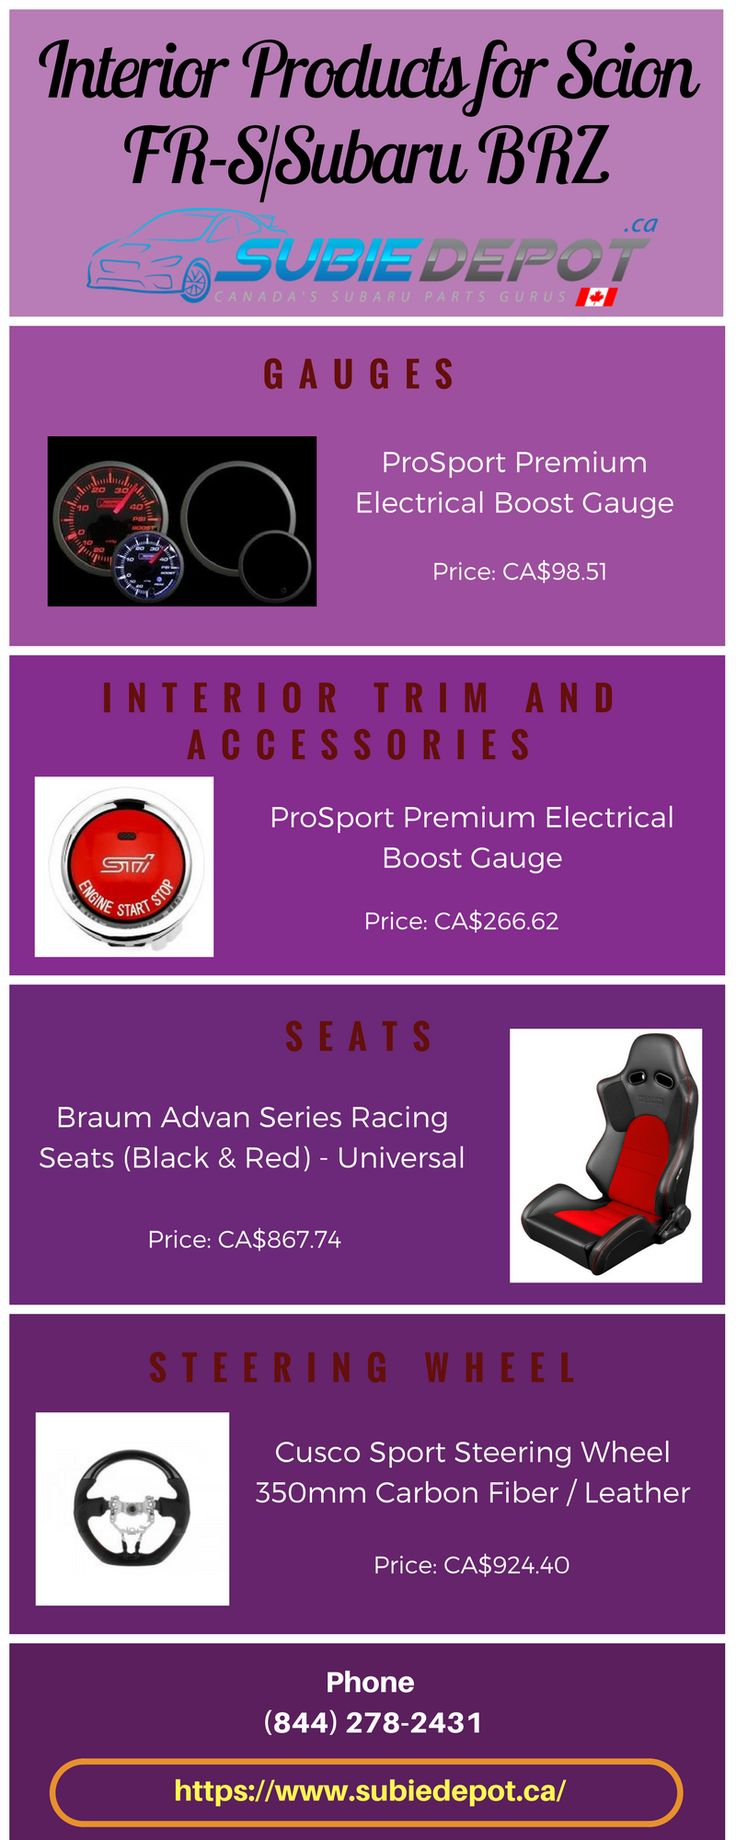 Interior Products for Scion FR-S/Subaru BRZ   SubieDepot